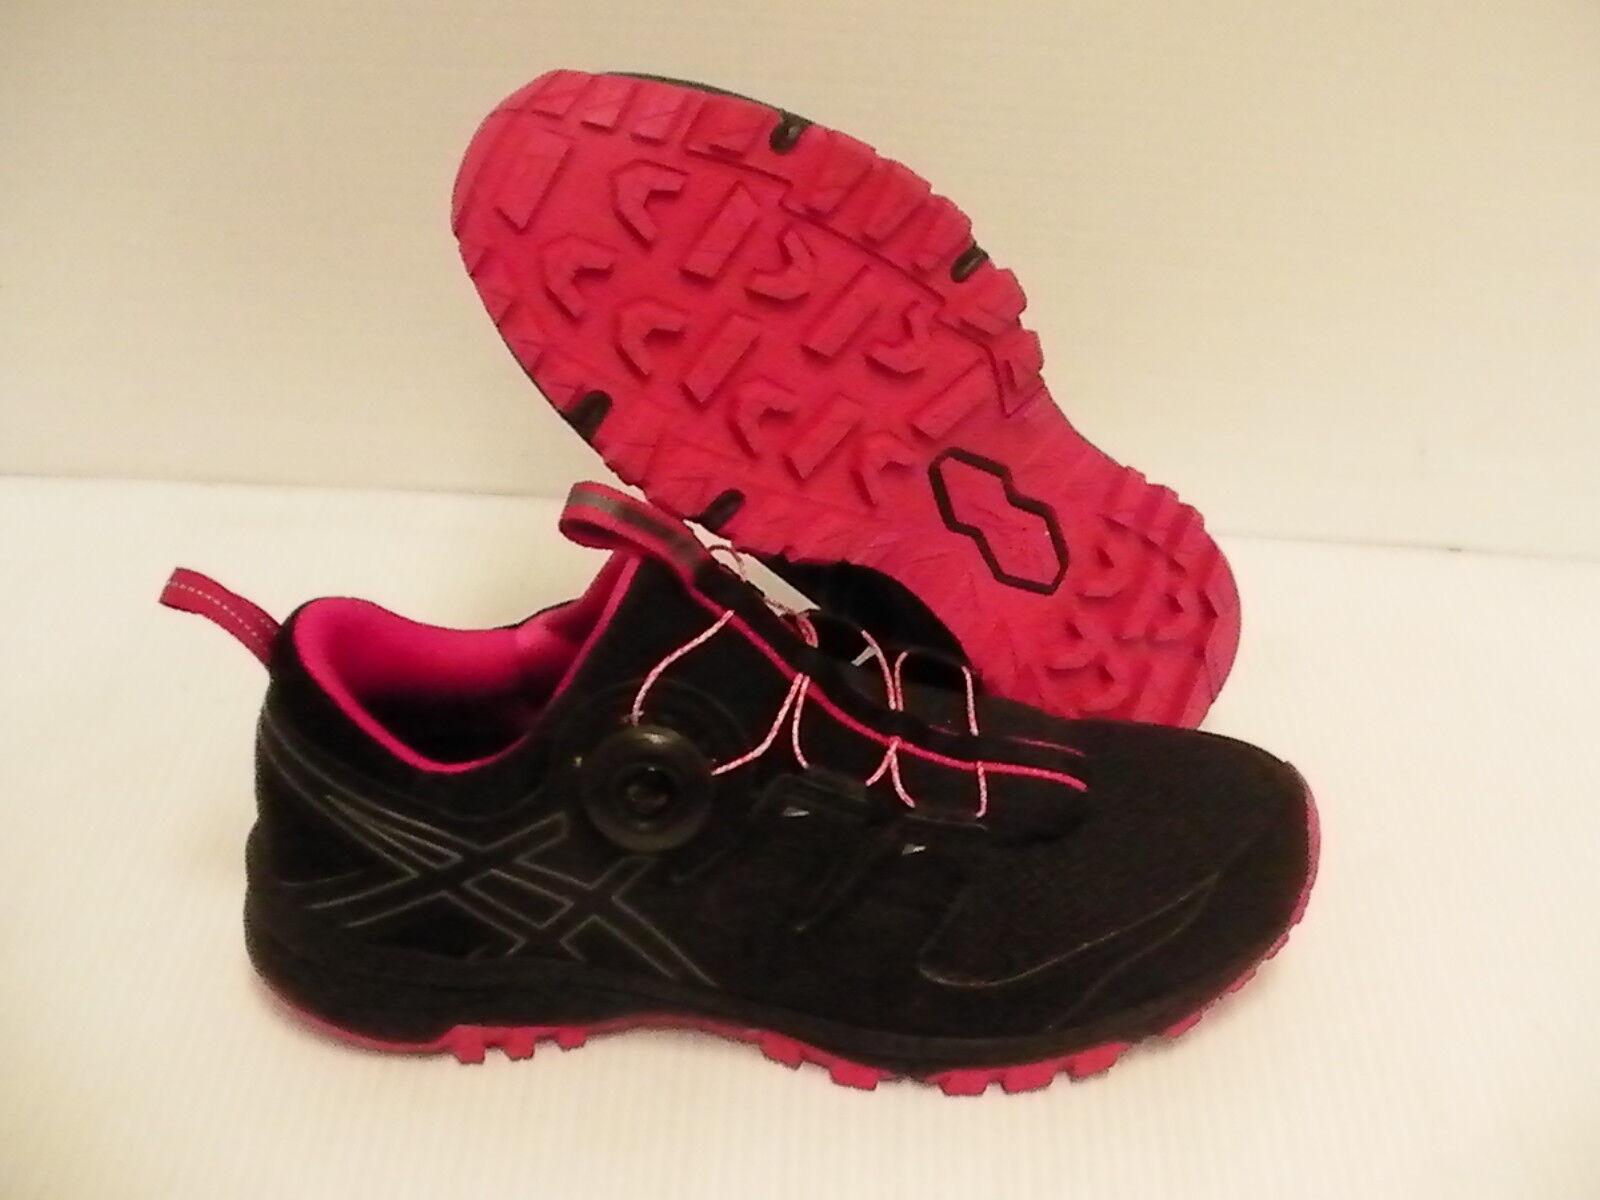 Asics femmes gel running FujiRado rose running gel chaussures noir carbon cosmo 3cf12d